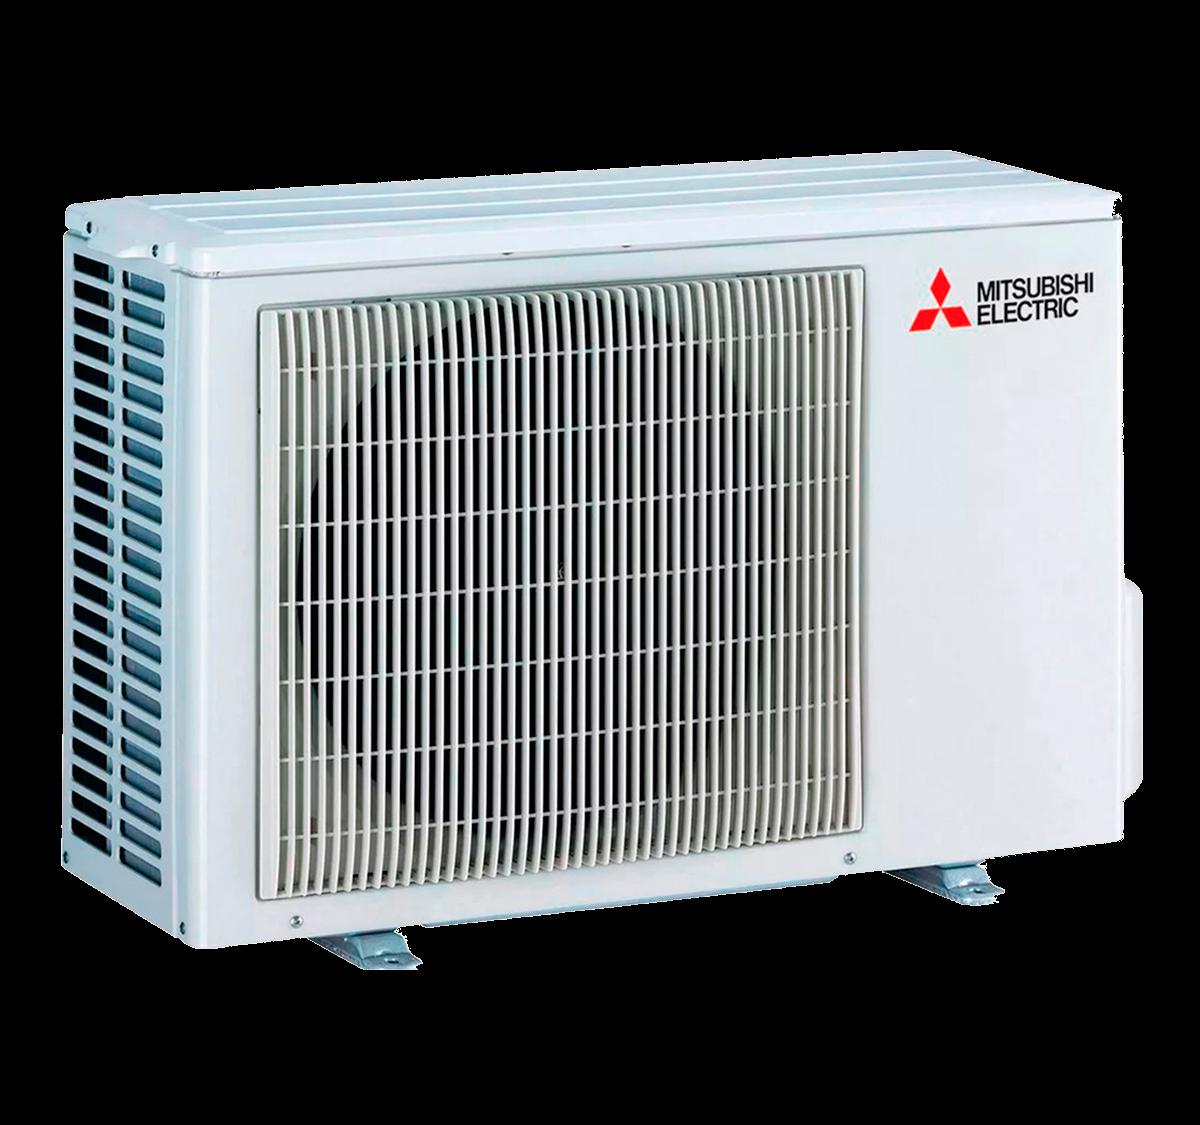 aire acondicionado unidad exterior mitsubishi electric inverter muz ln25vg serie kirigamine style modelo msz ln25vgb precio incluido instalacion caseragua 01